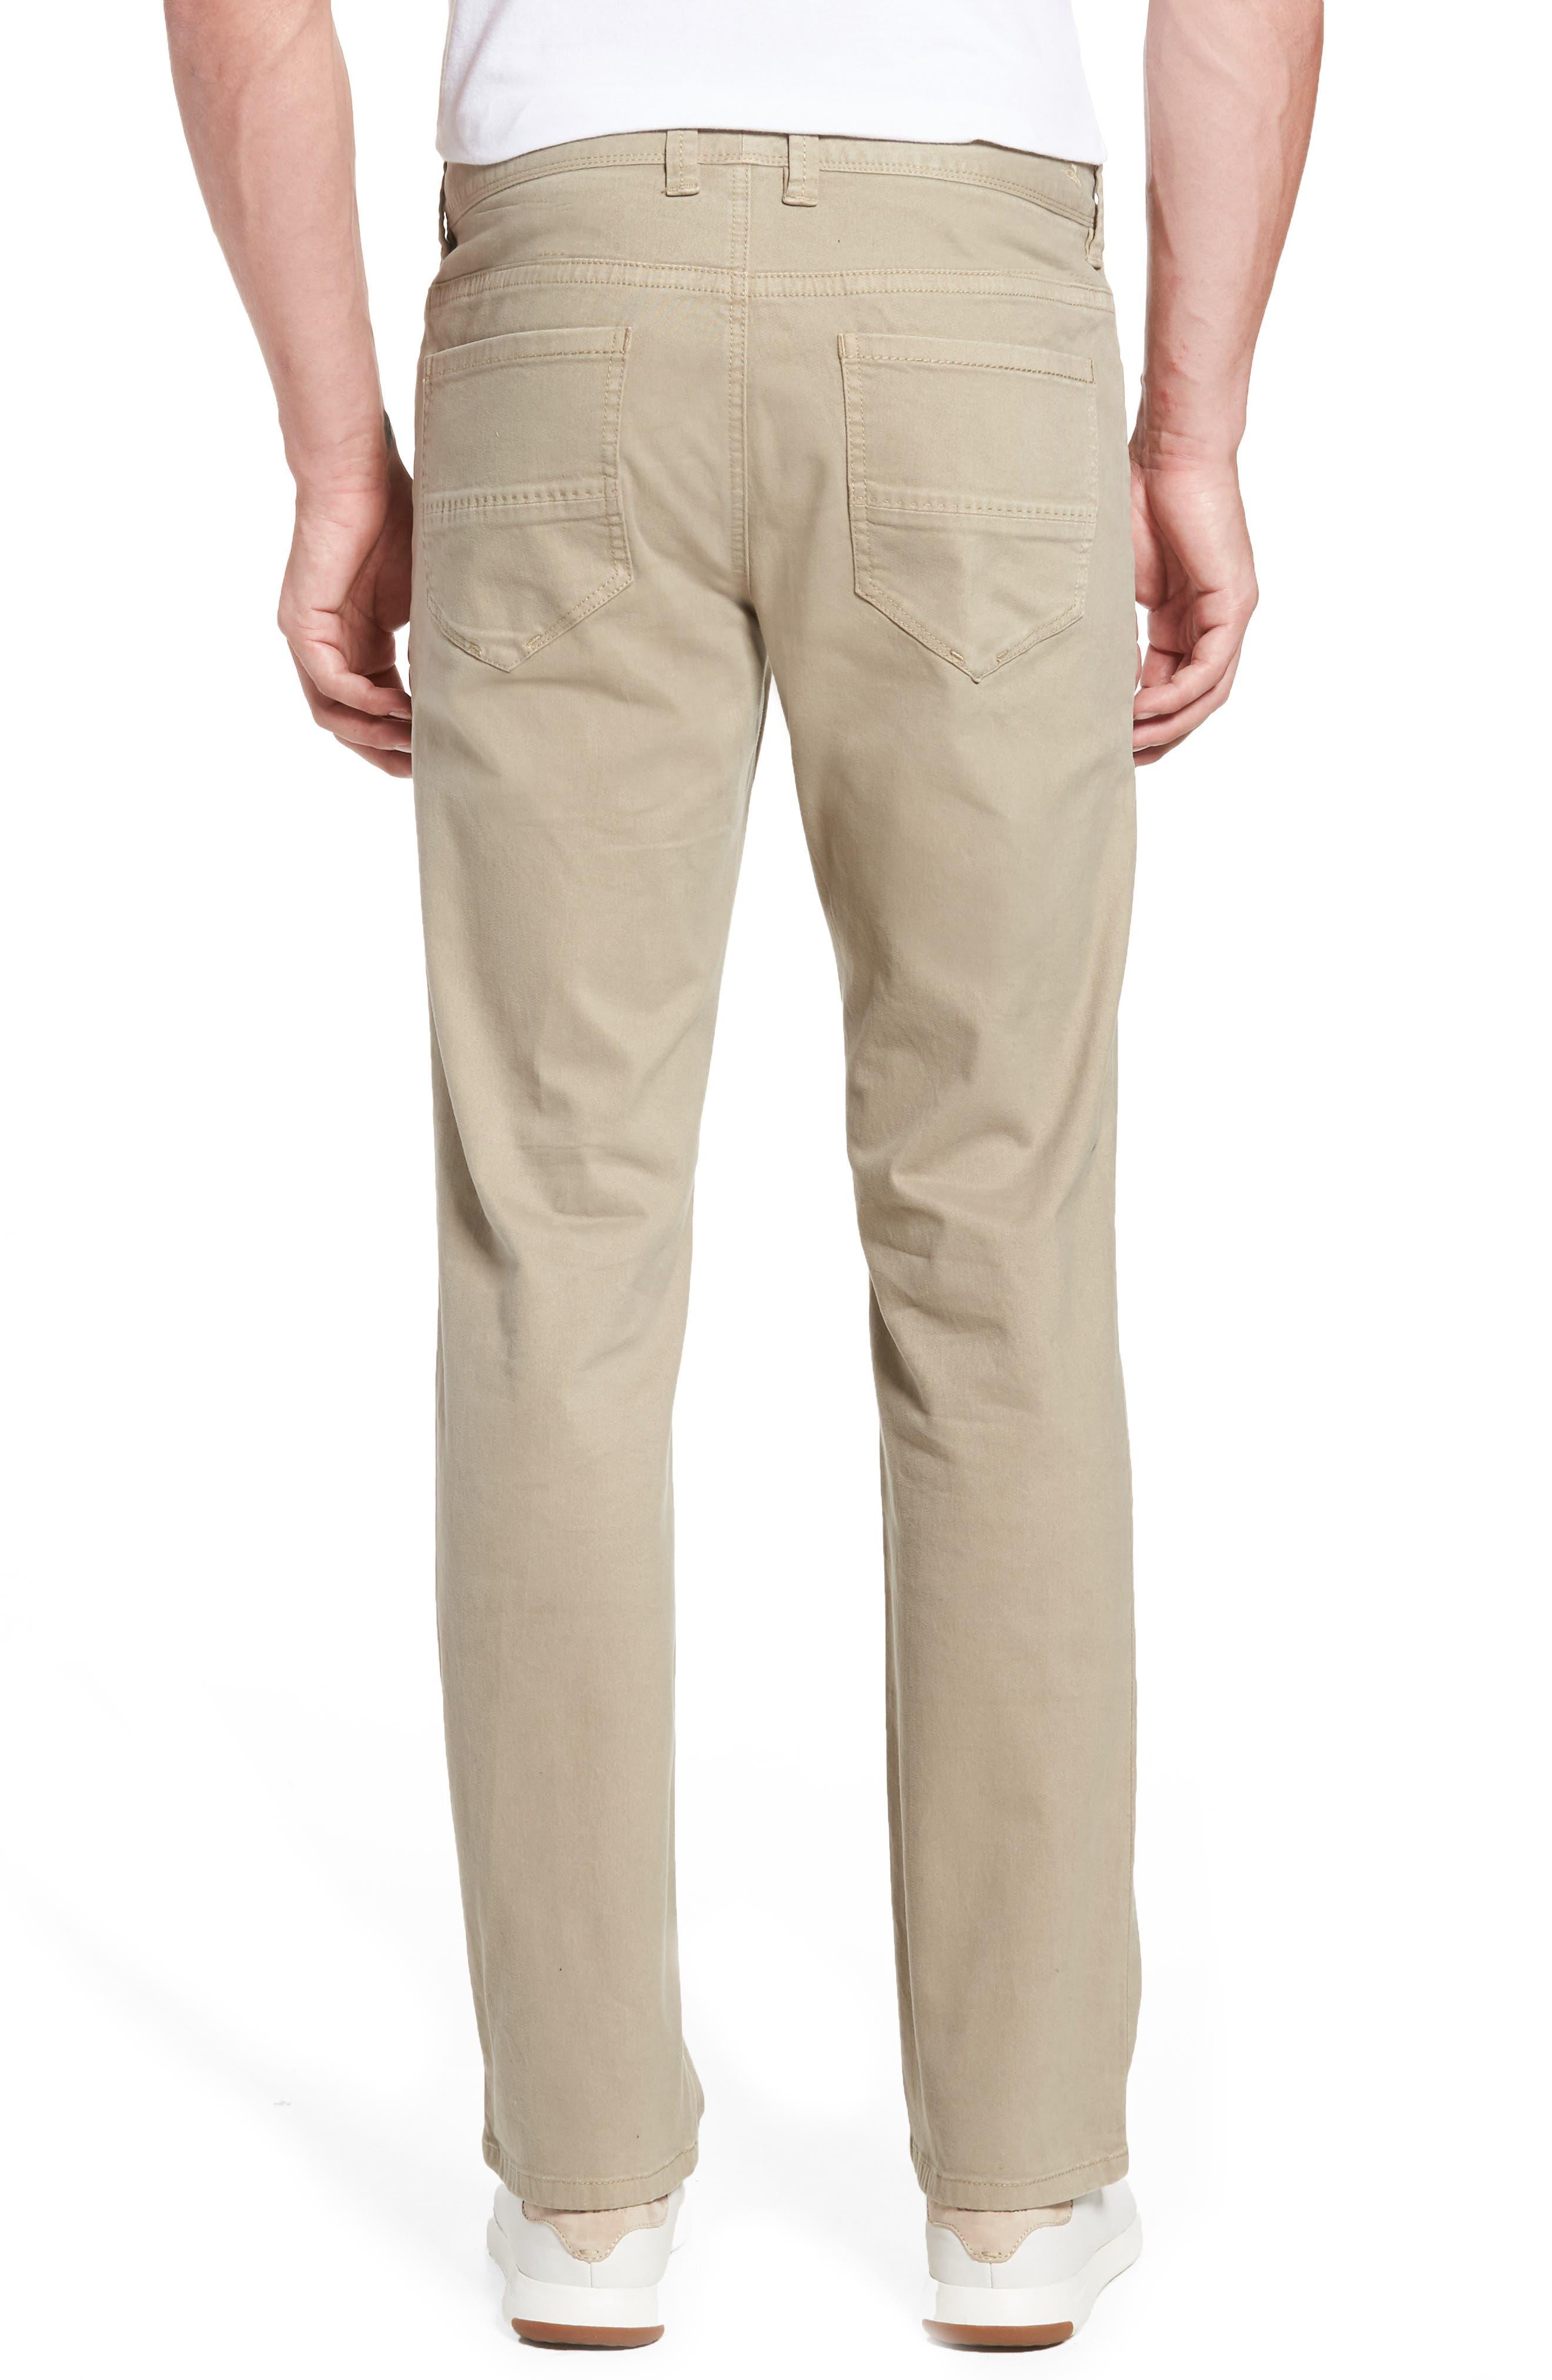 Boracay Pants,                             Alternate thumbnail 2, color,                             Khaki